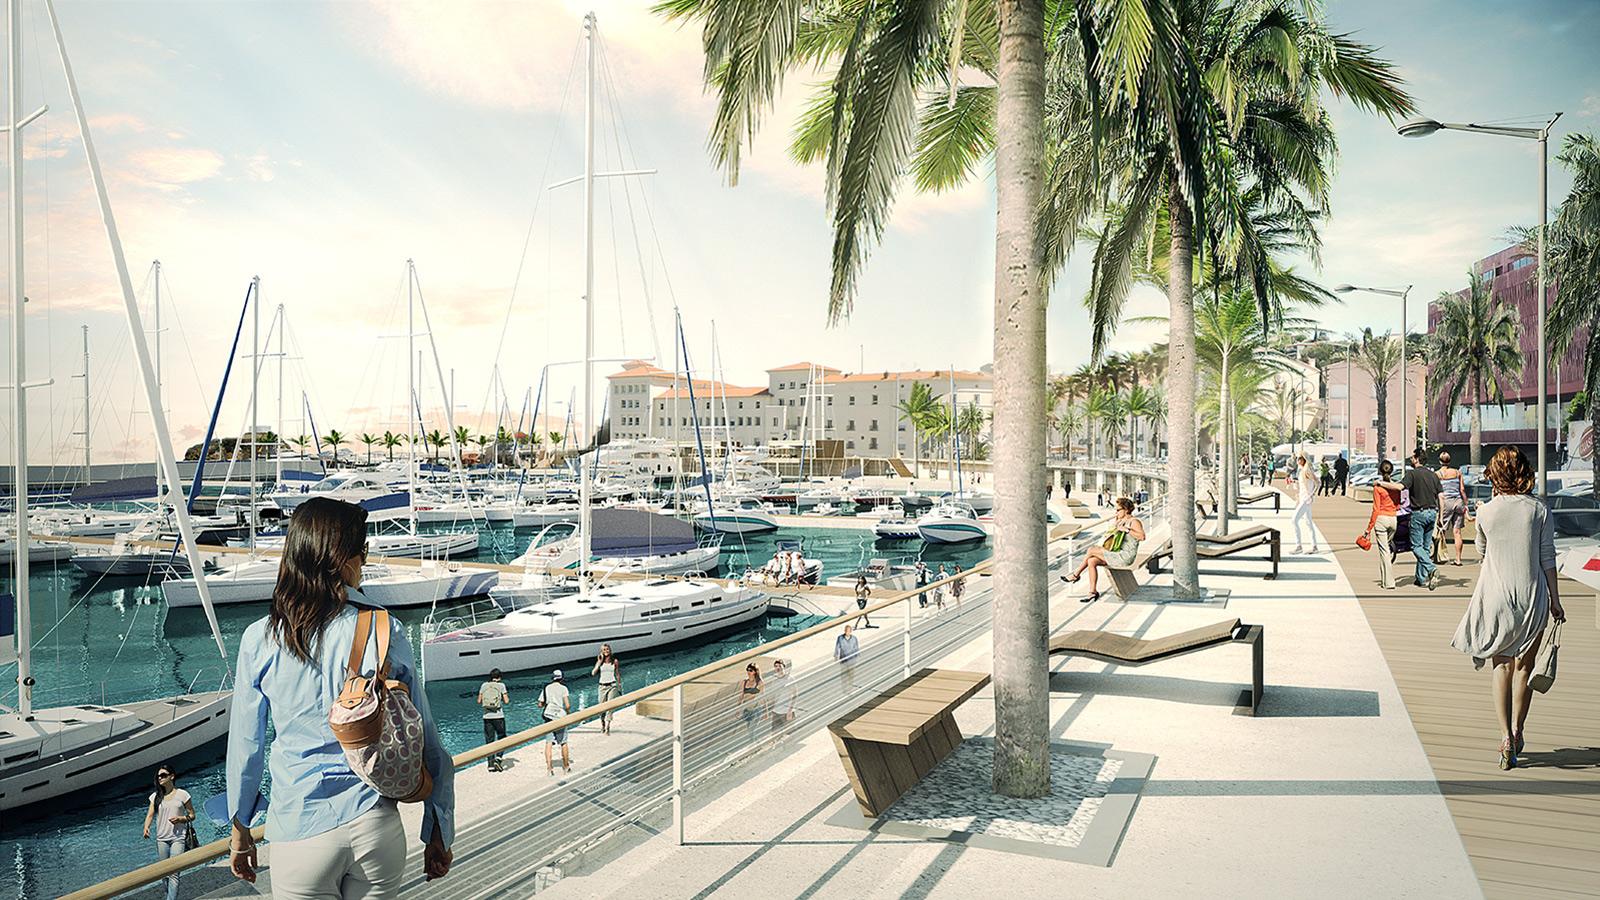 matteo-gennari-architecte-port-banyuls-1